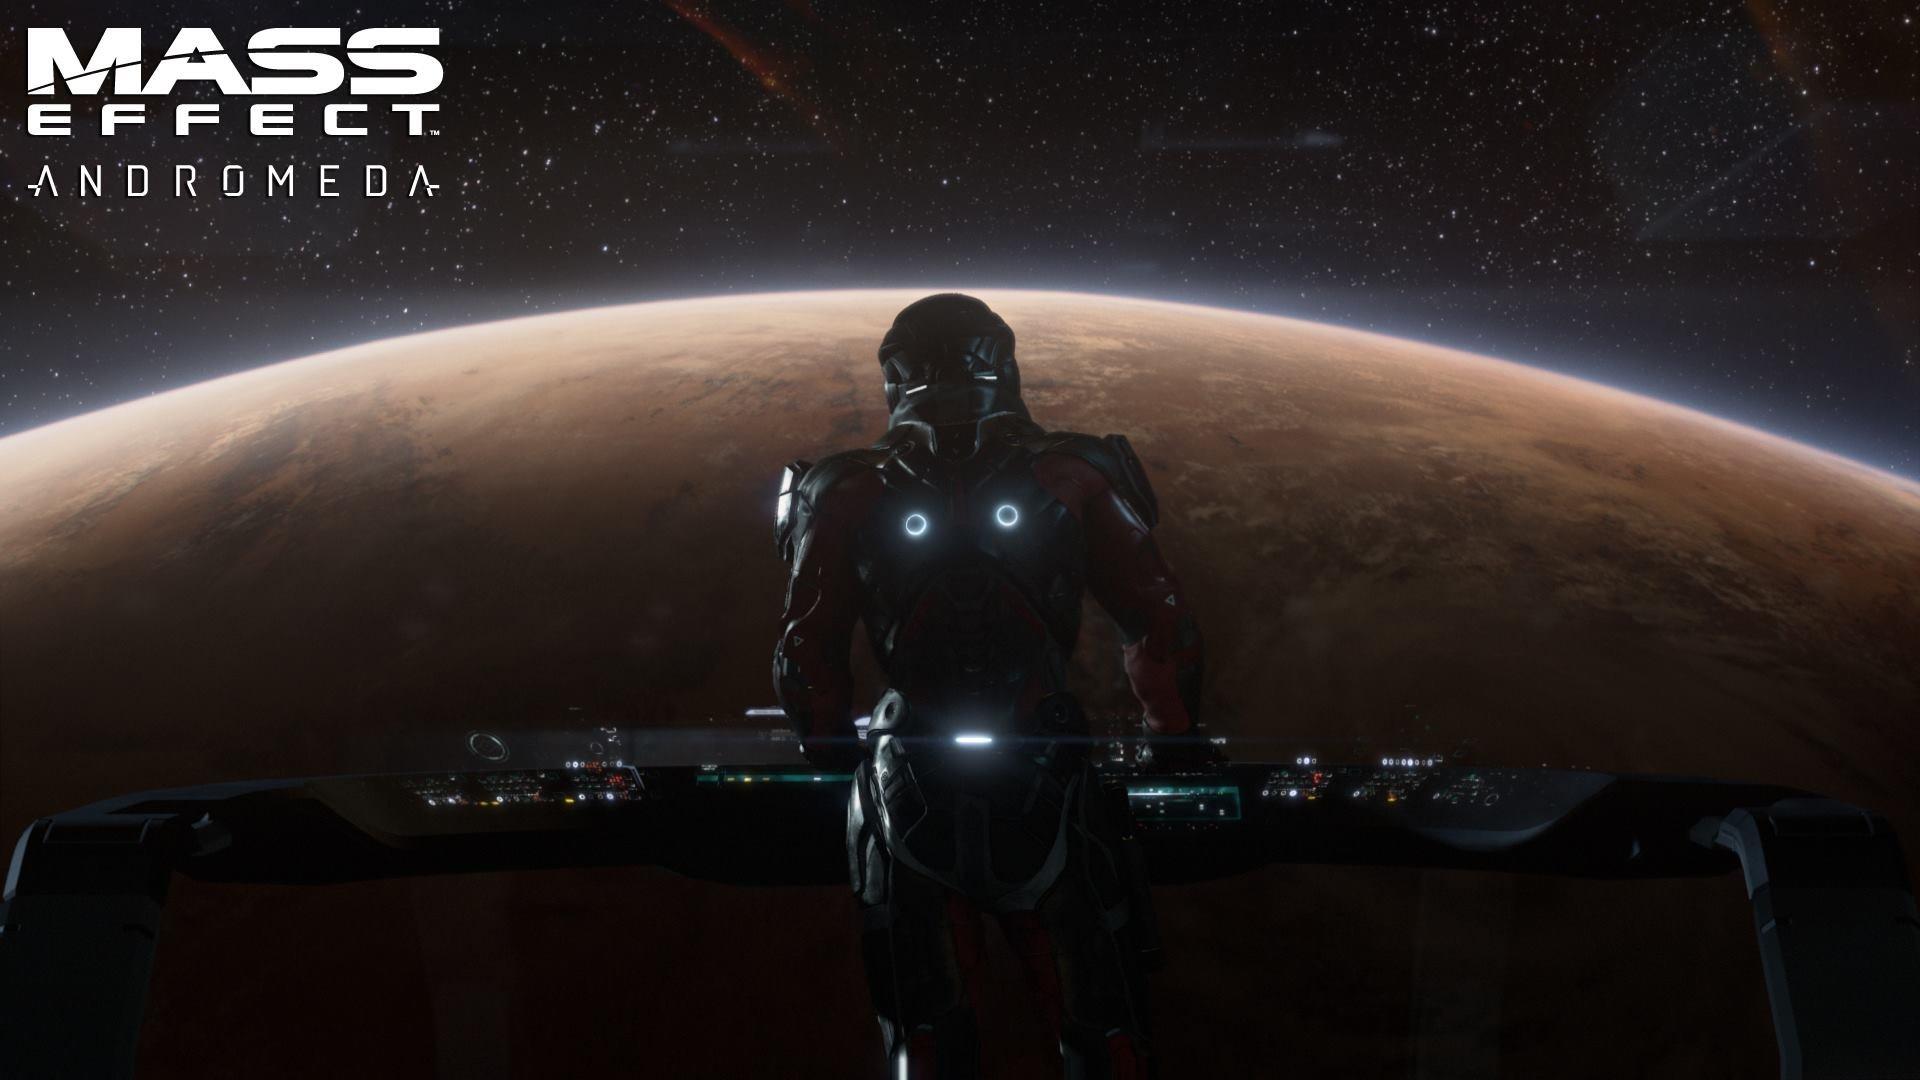 Mass Effect: Andromeda Computer Wallpapers, Desktop Backgrounds ...